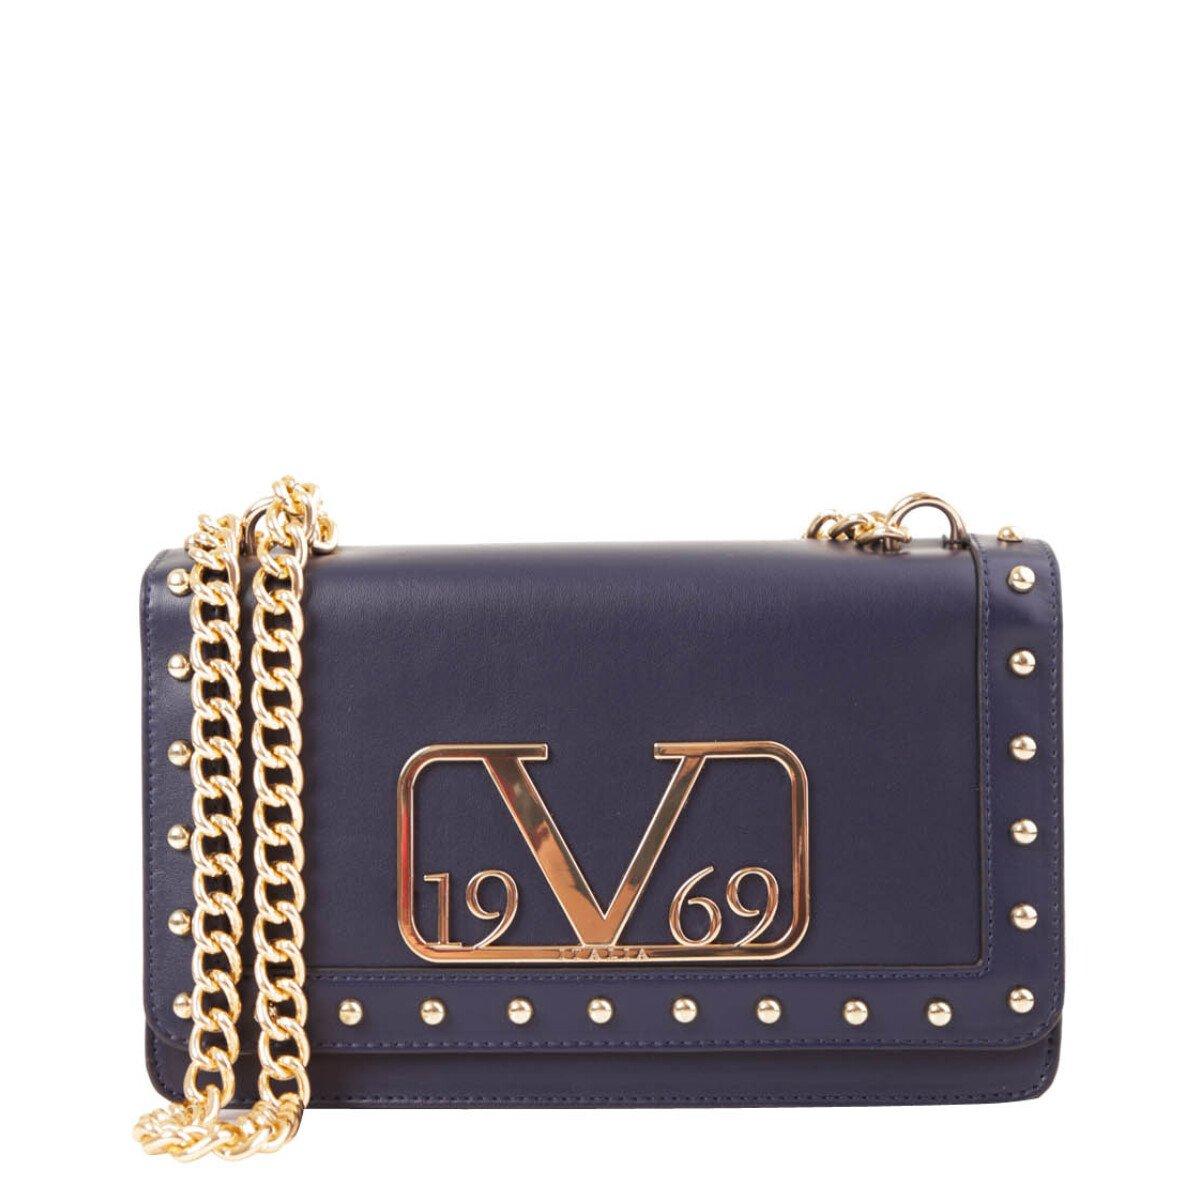 19v69 Italia Women's Shoulder Bag Various Colours 318683 - blue UNICA